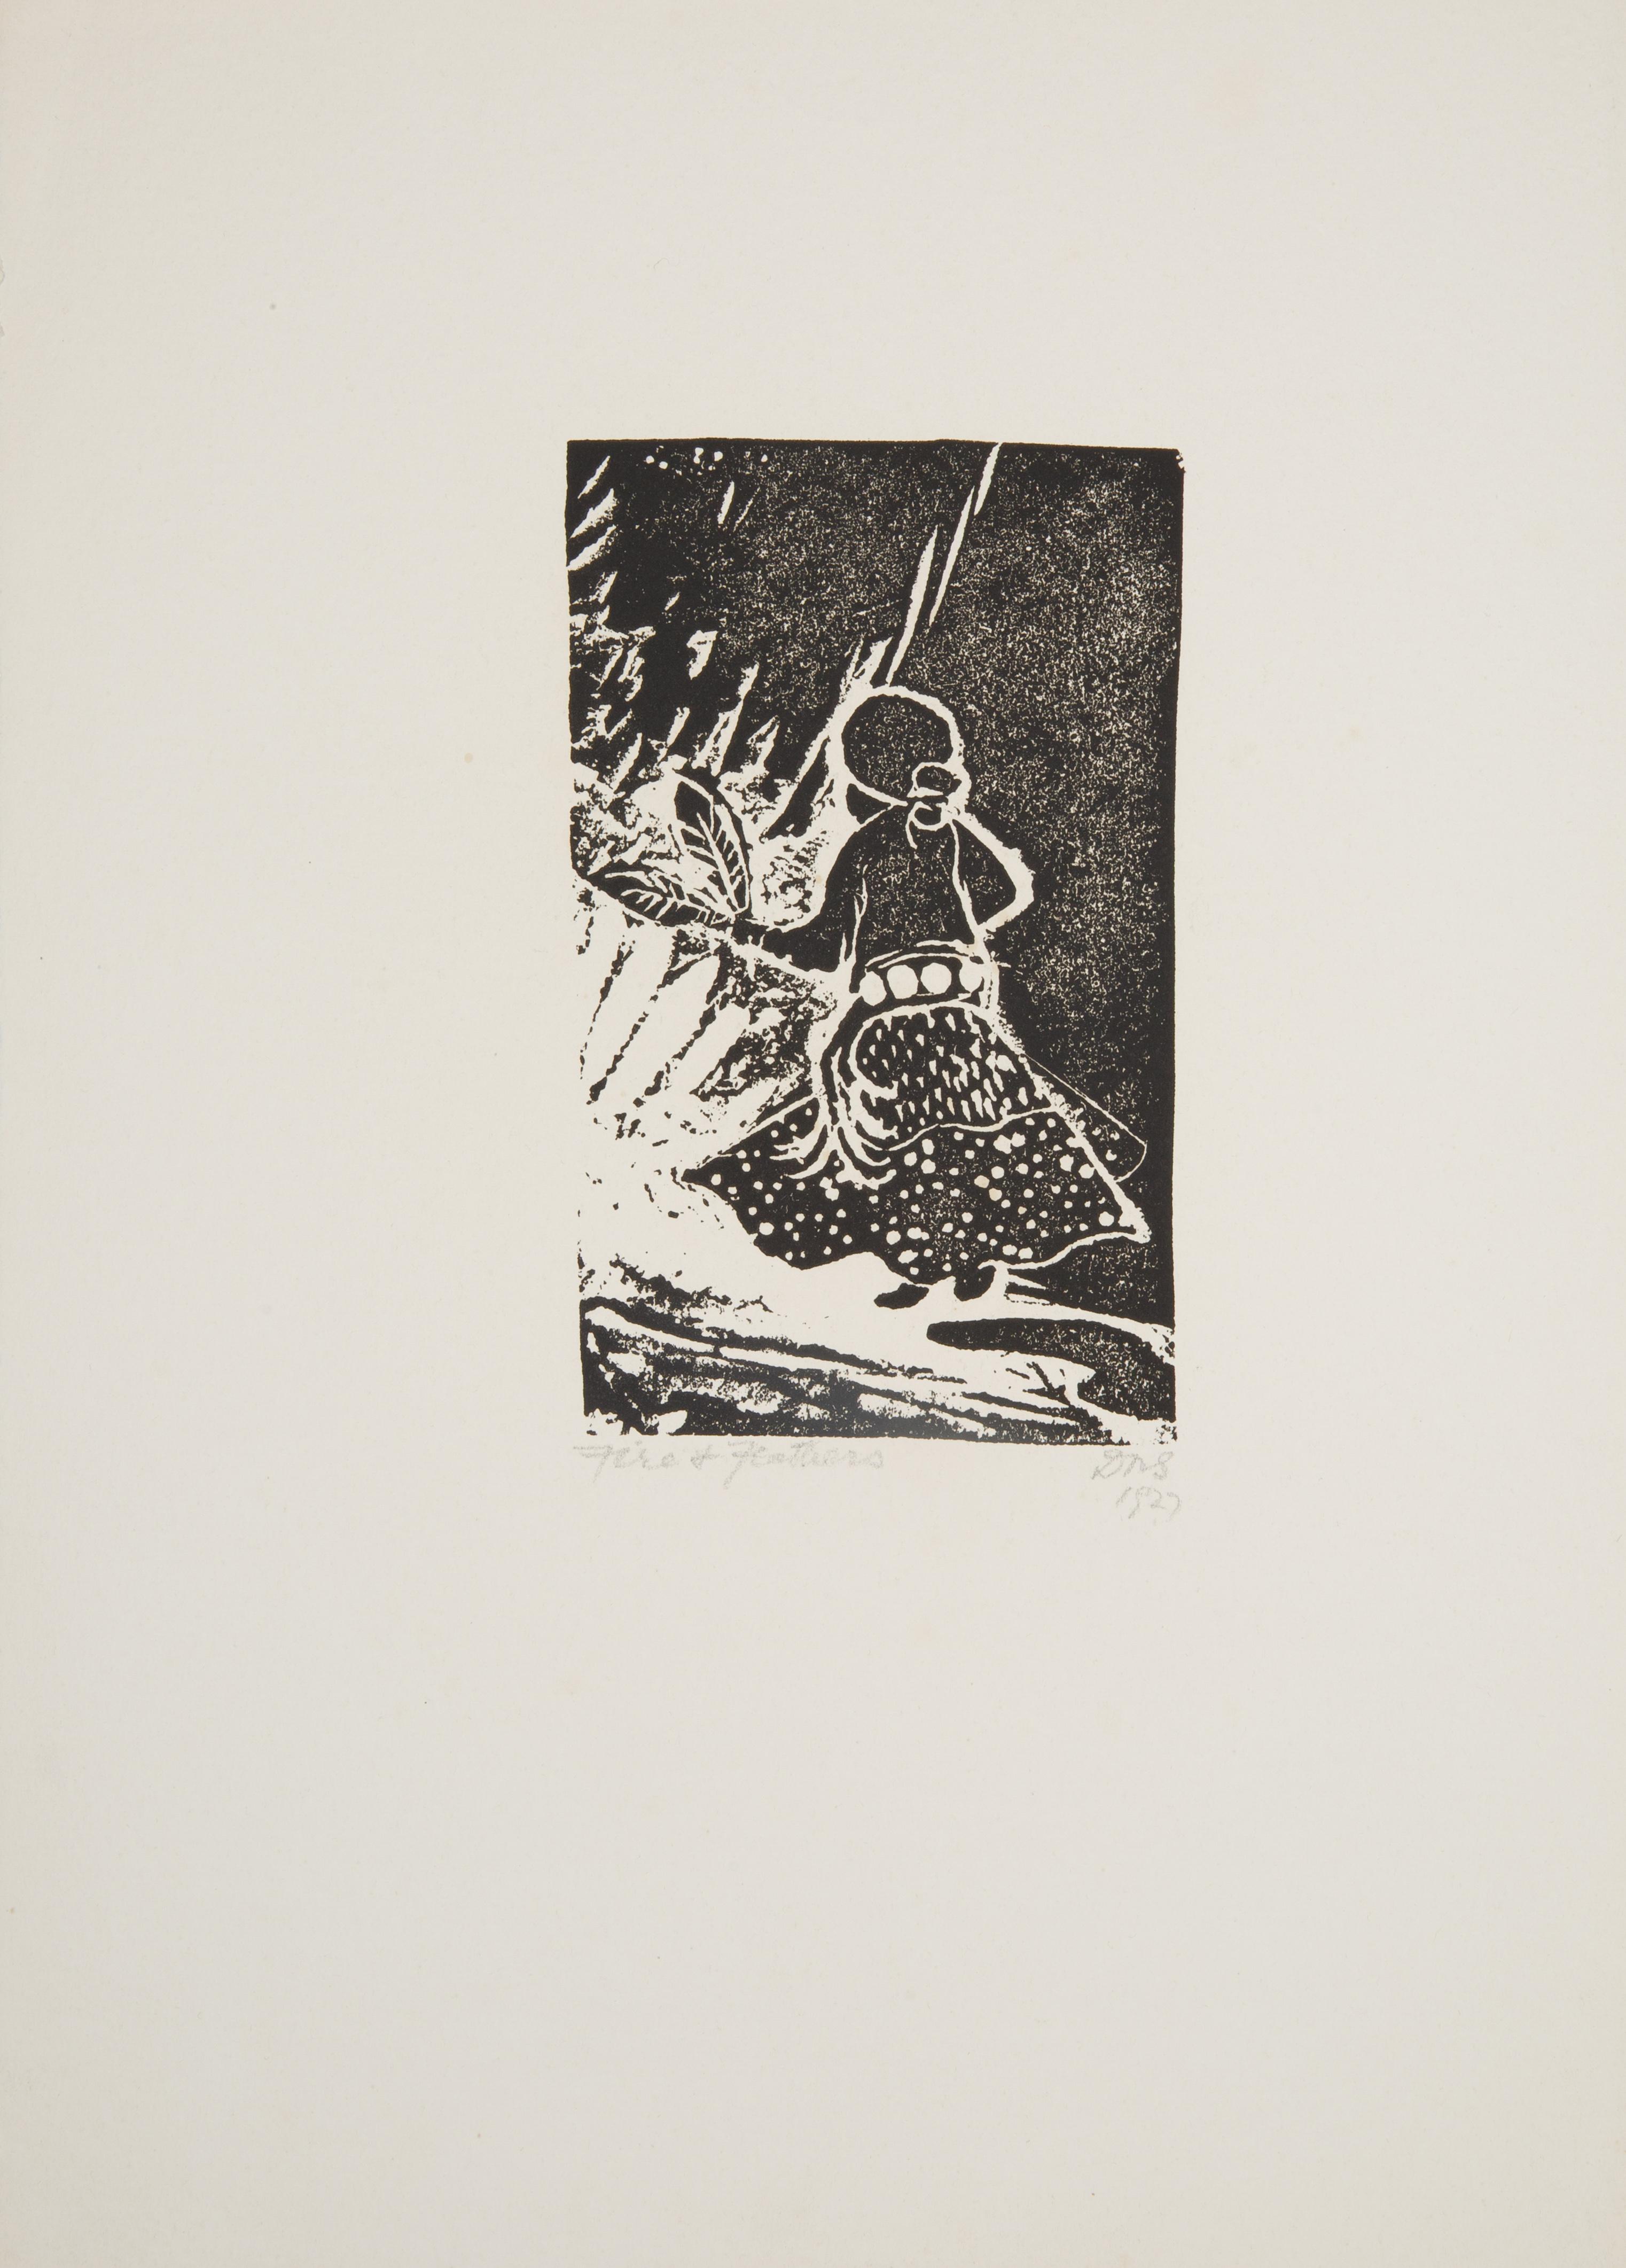 DOROTHY NEWKIRK STEWART (AMERICAN 1891-1995) - Image 3 of 5